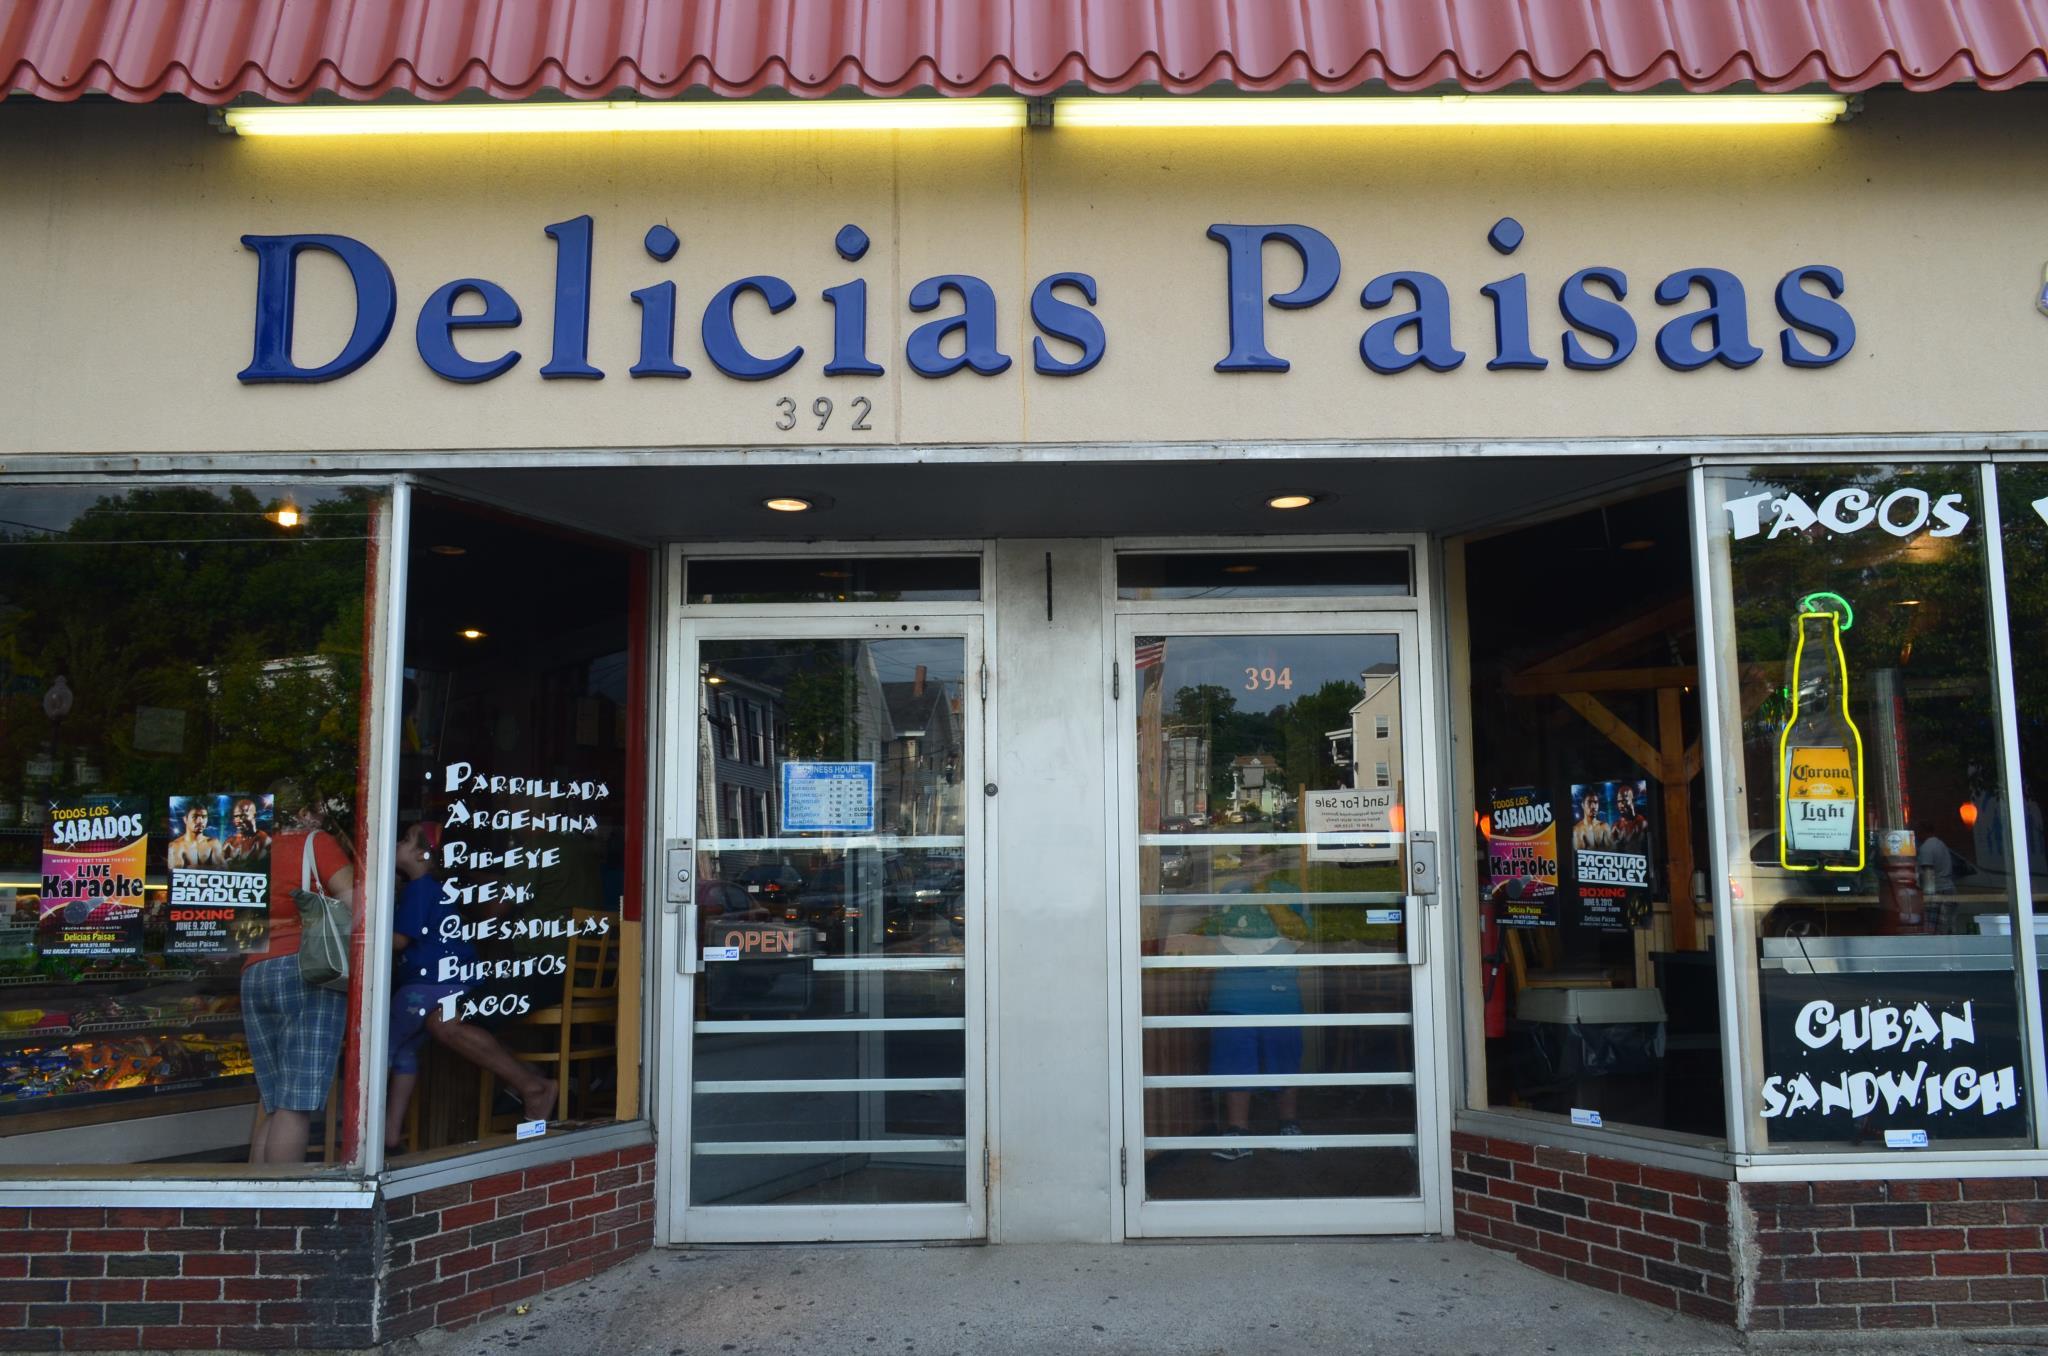 Delicias Paisas Bakery